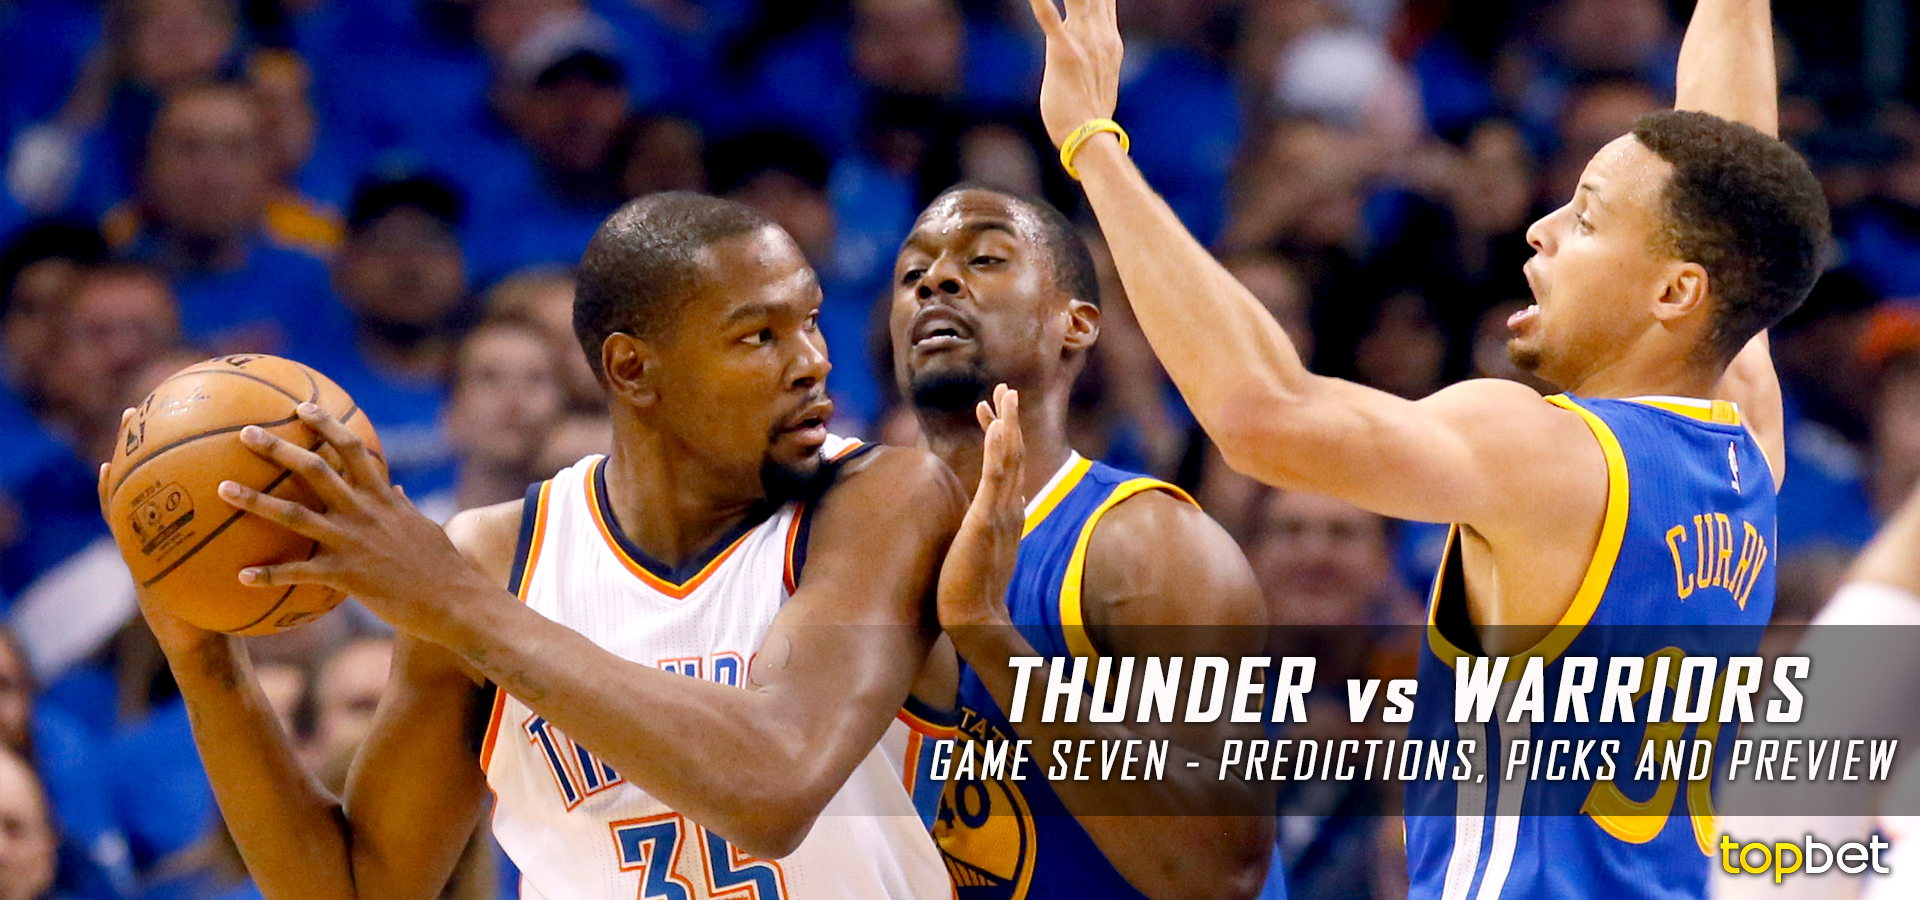 Cavaliers vs warriors game 7 predictions - Cavaliers Vs Warriors Game 7 Predictions 8